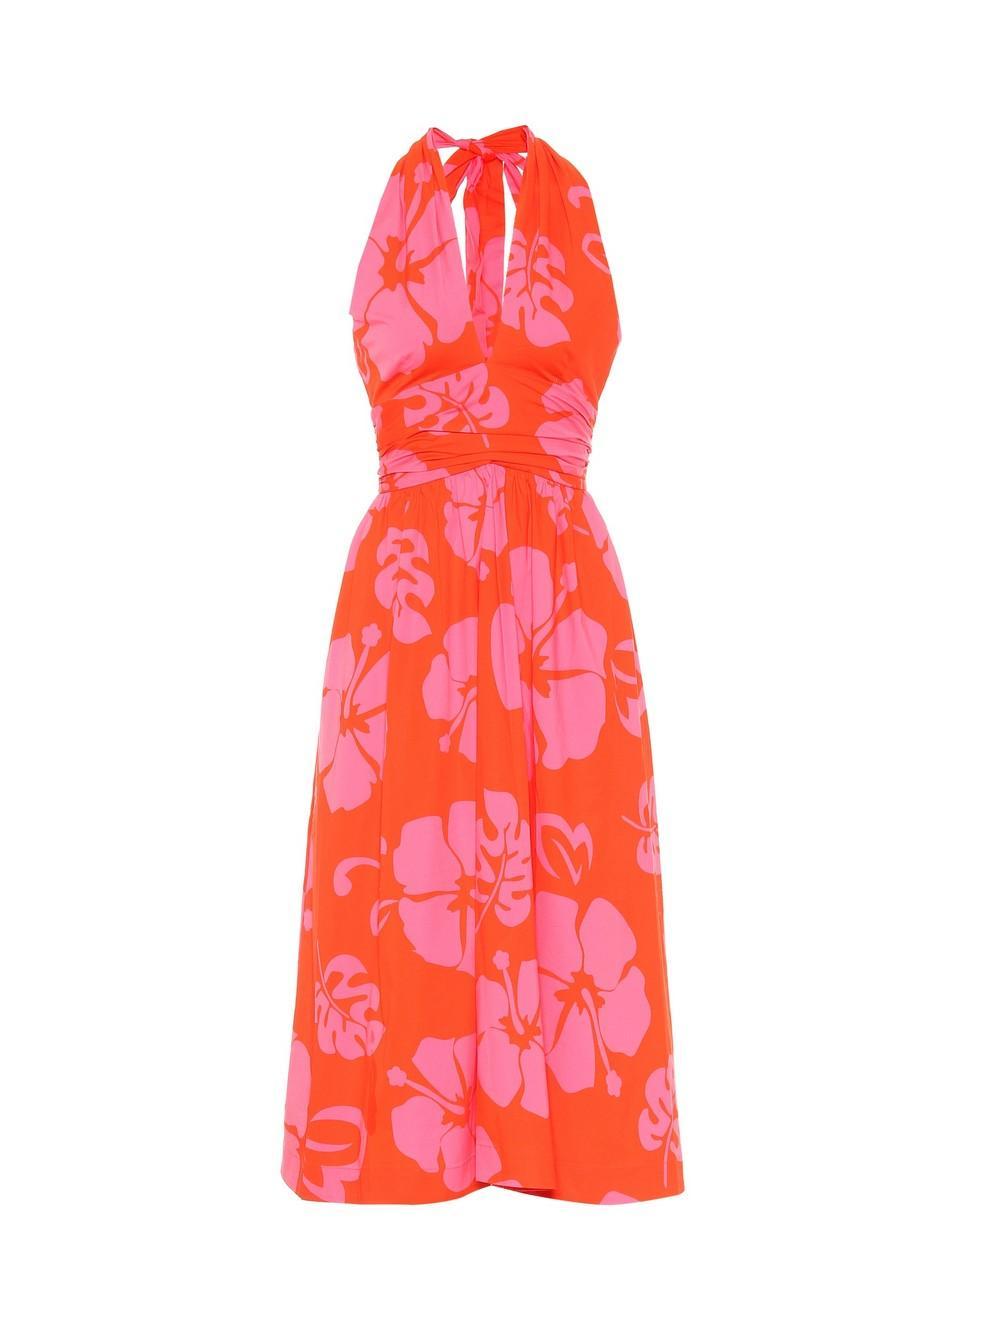 Moana Printed Cotton Halter Dress Item # 148-7325-RDHB